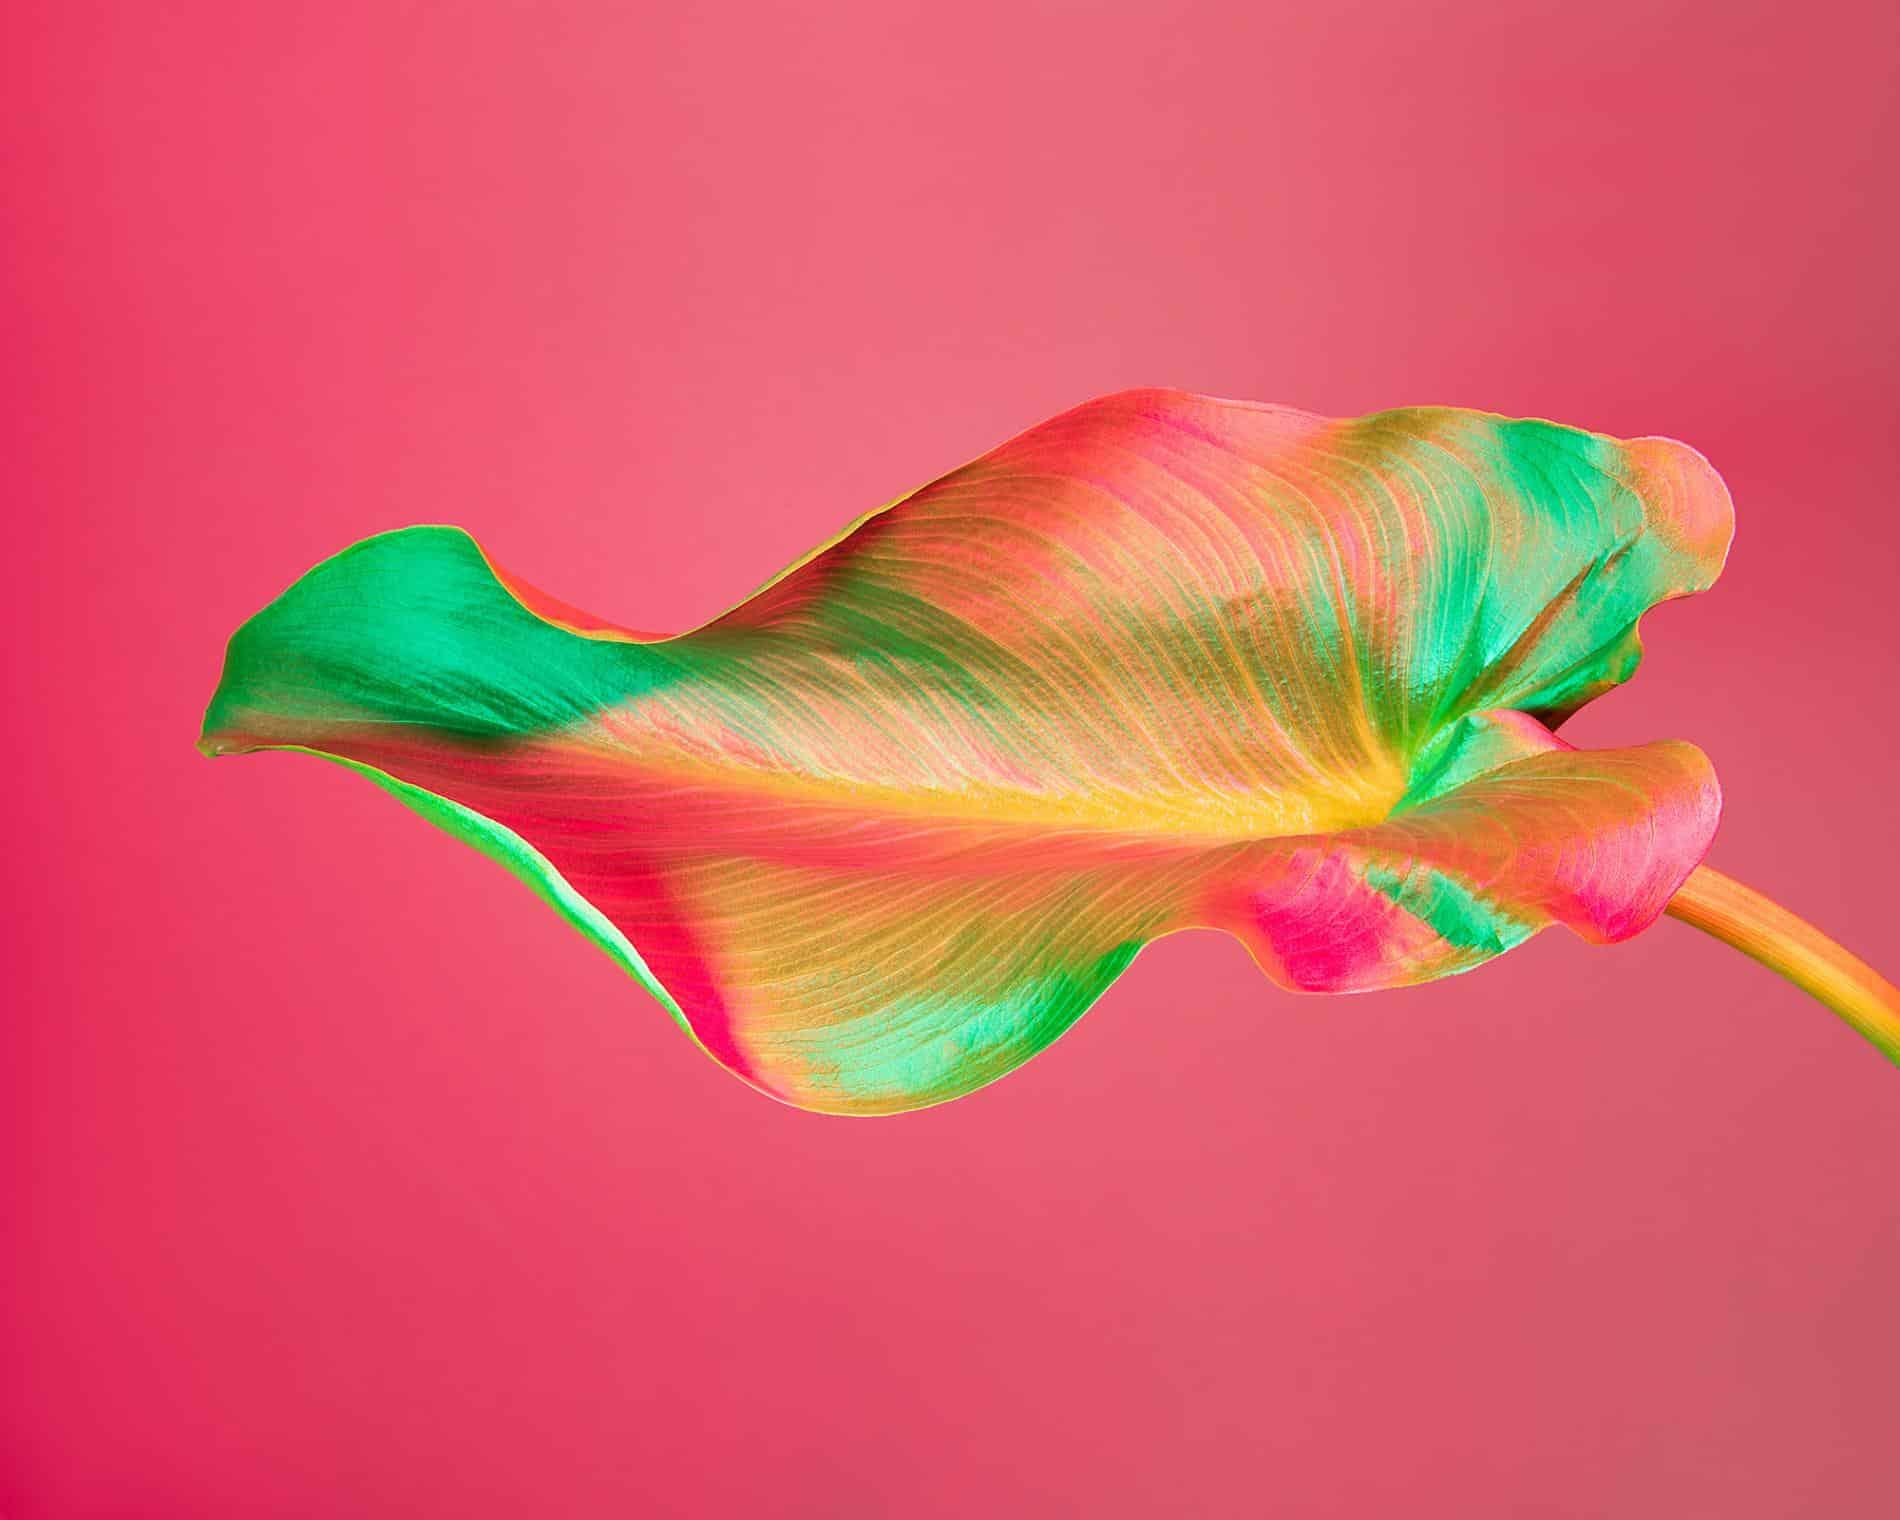 rickert flores botanica de otro mundo calla lily leafe